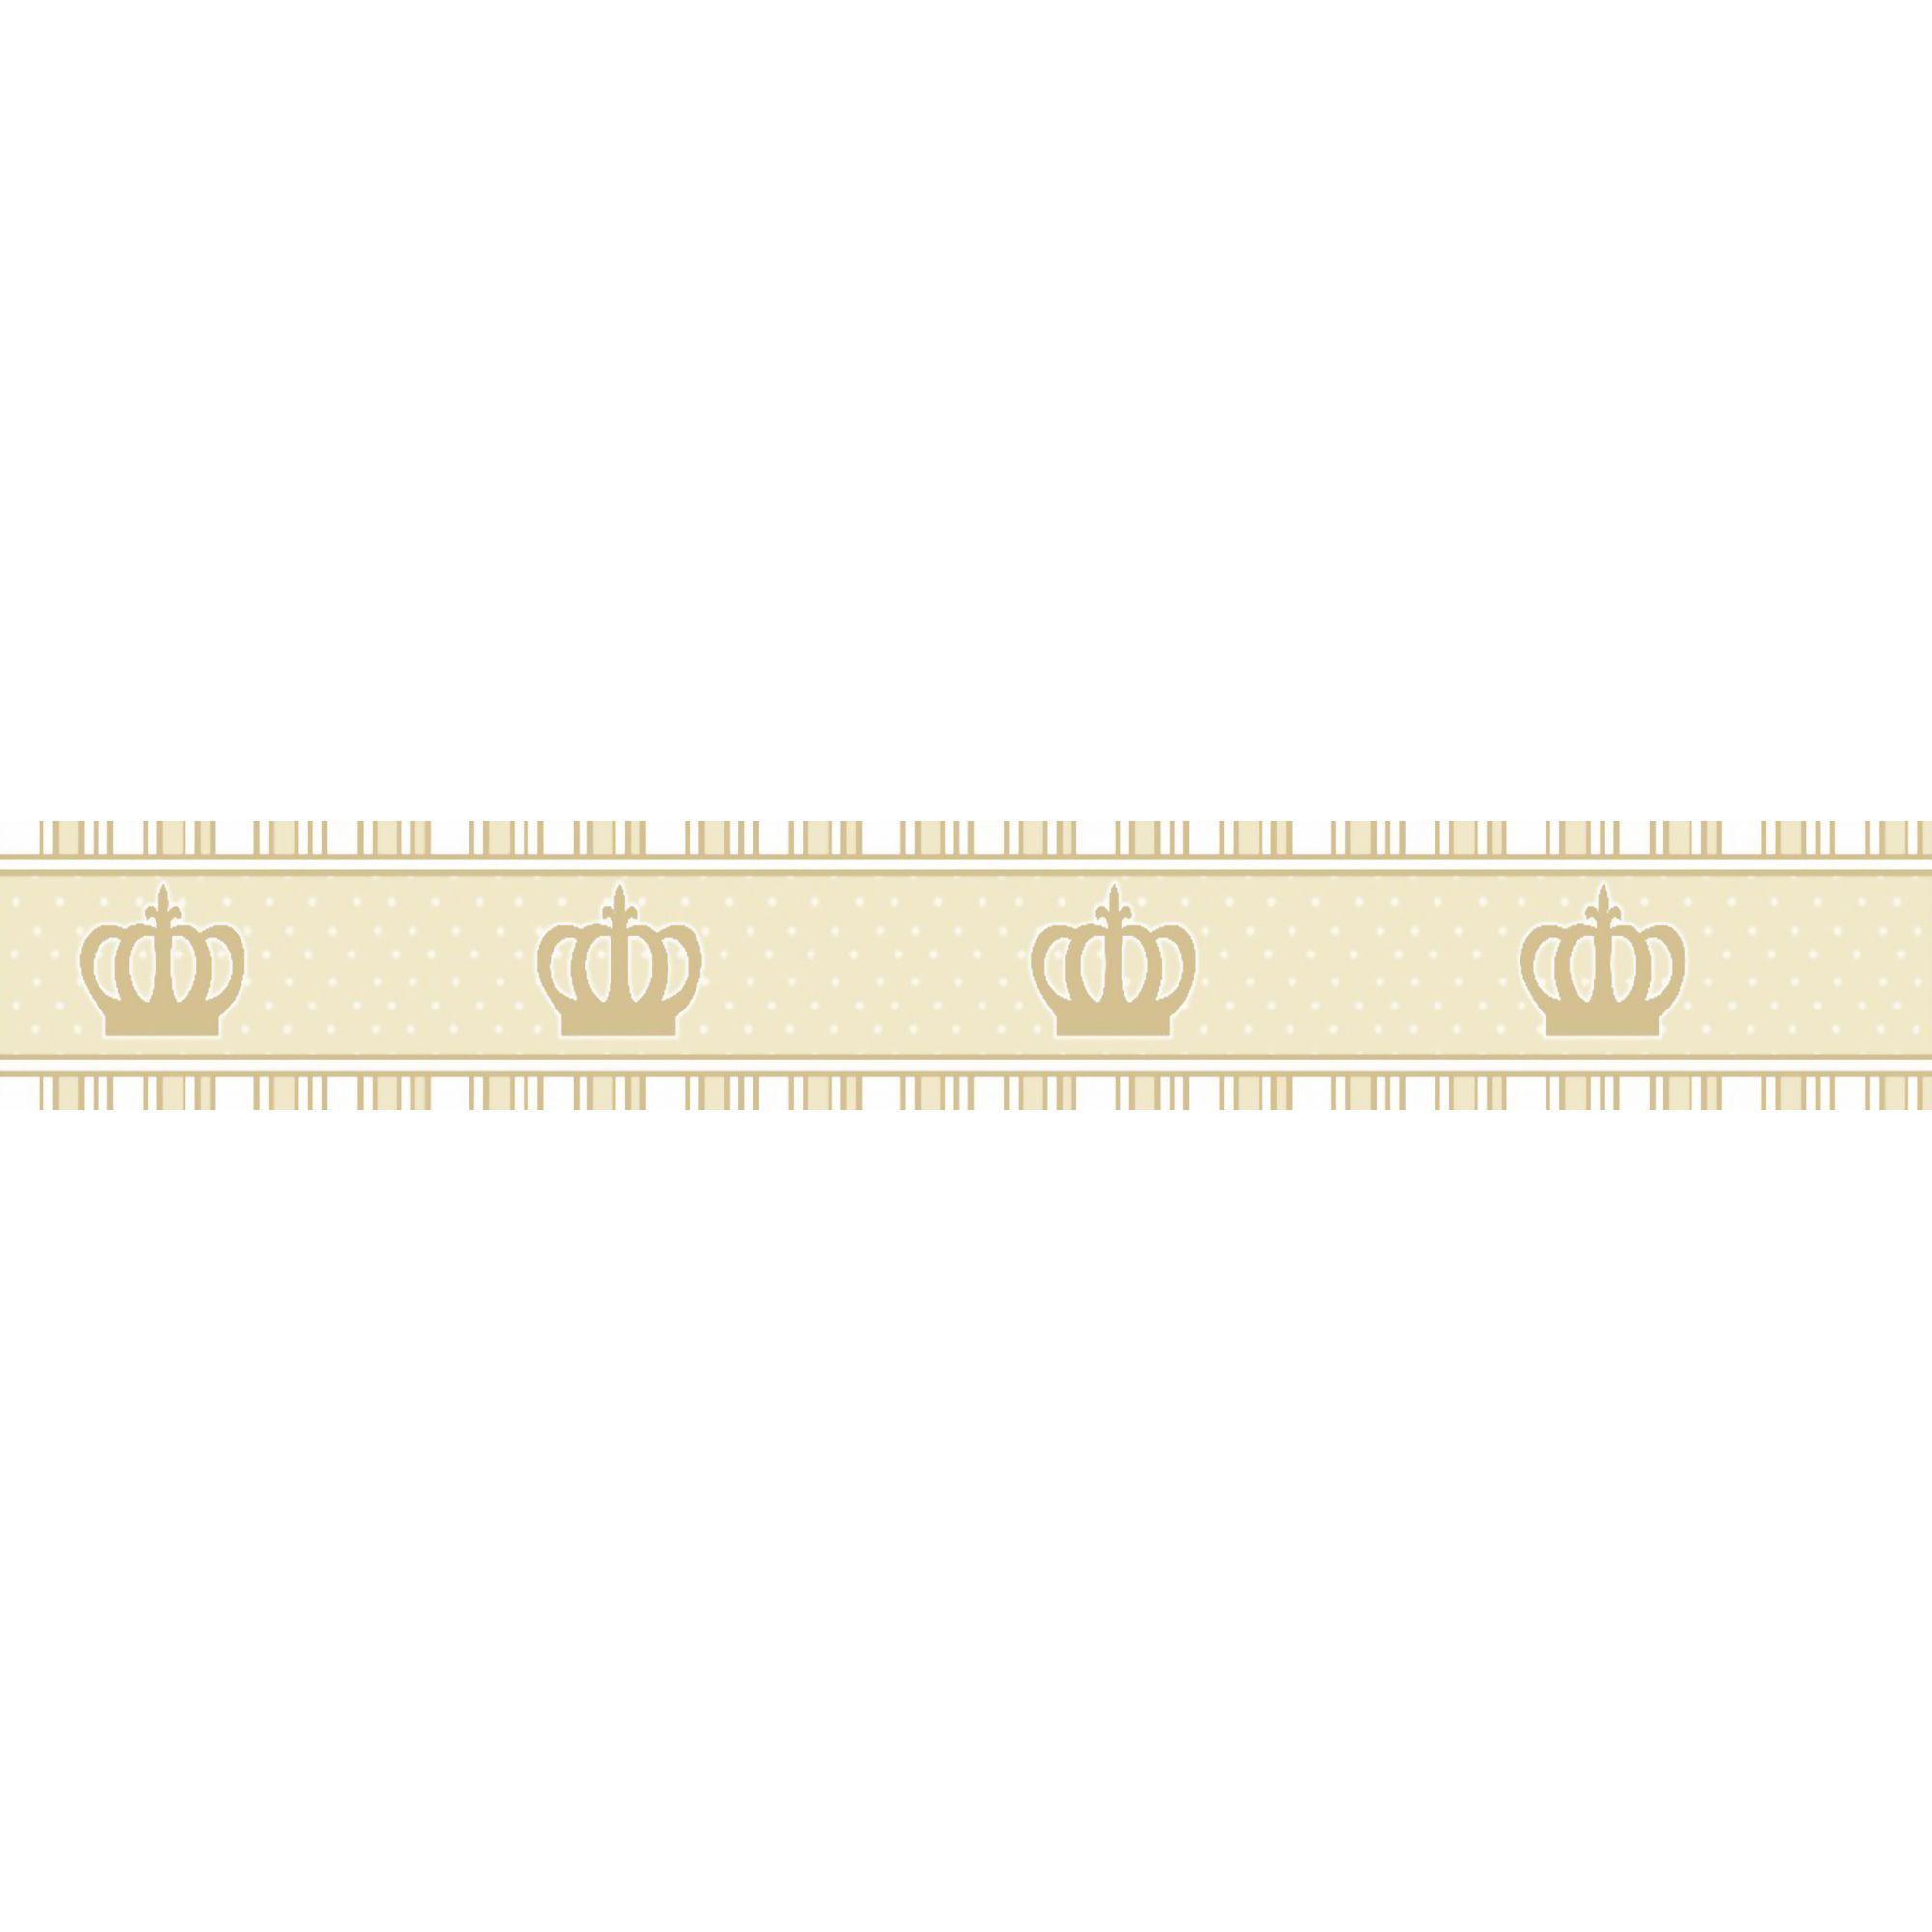 Faixa Decorativa Adesiva Coroa Bege  - Final Decor